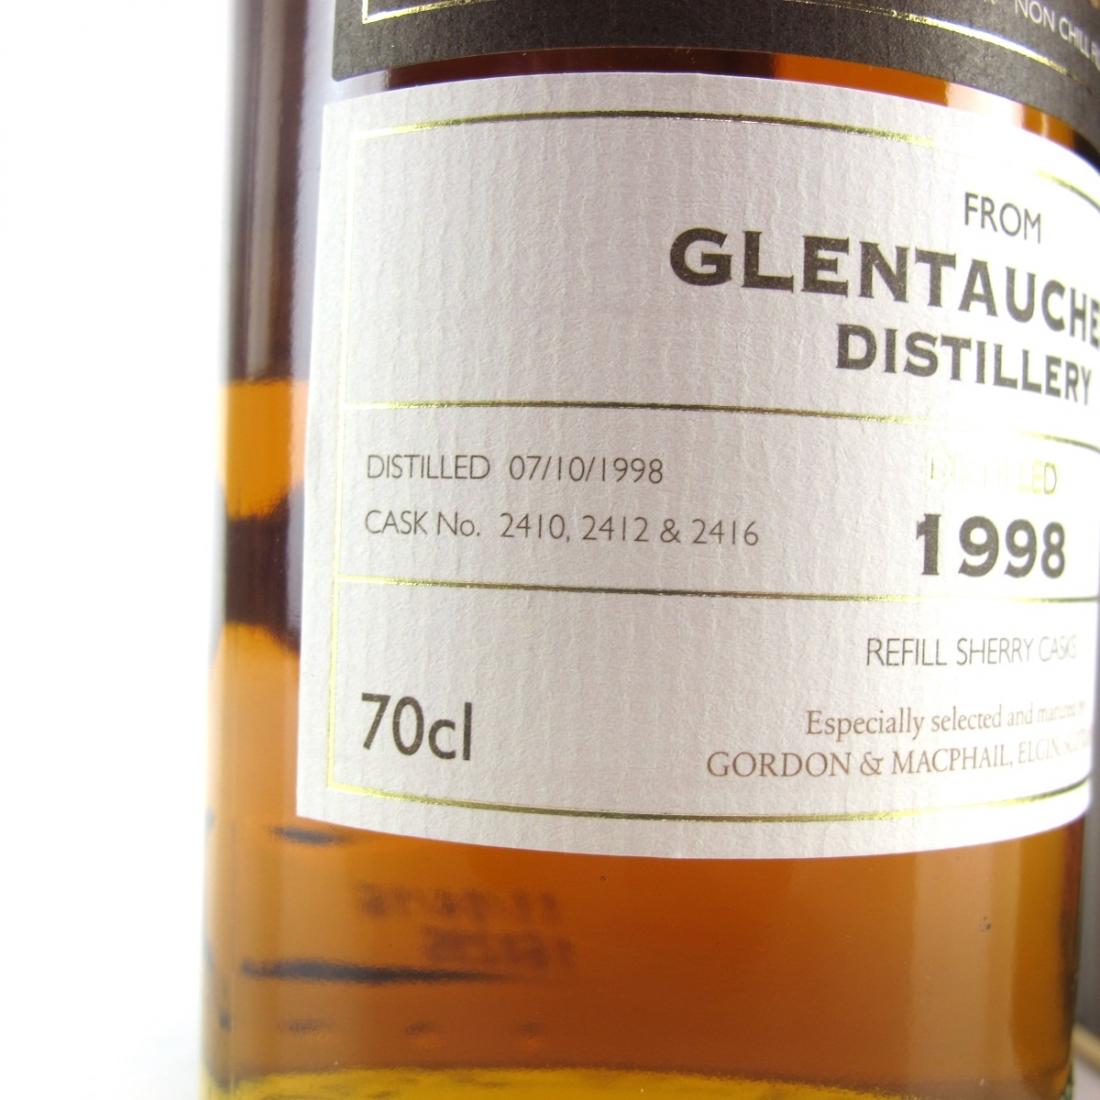 Glentauchers 1998 Gordon & MacPhail Cask Strength